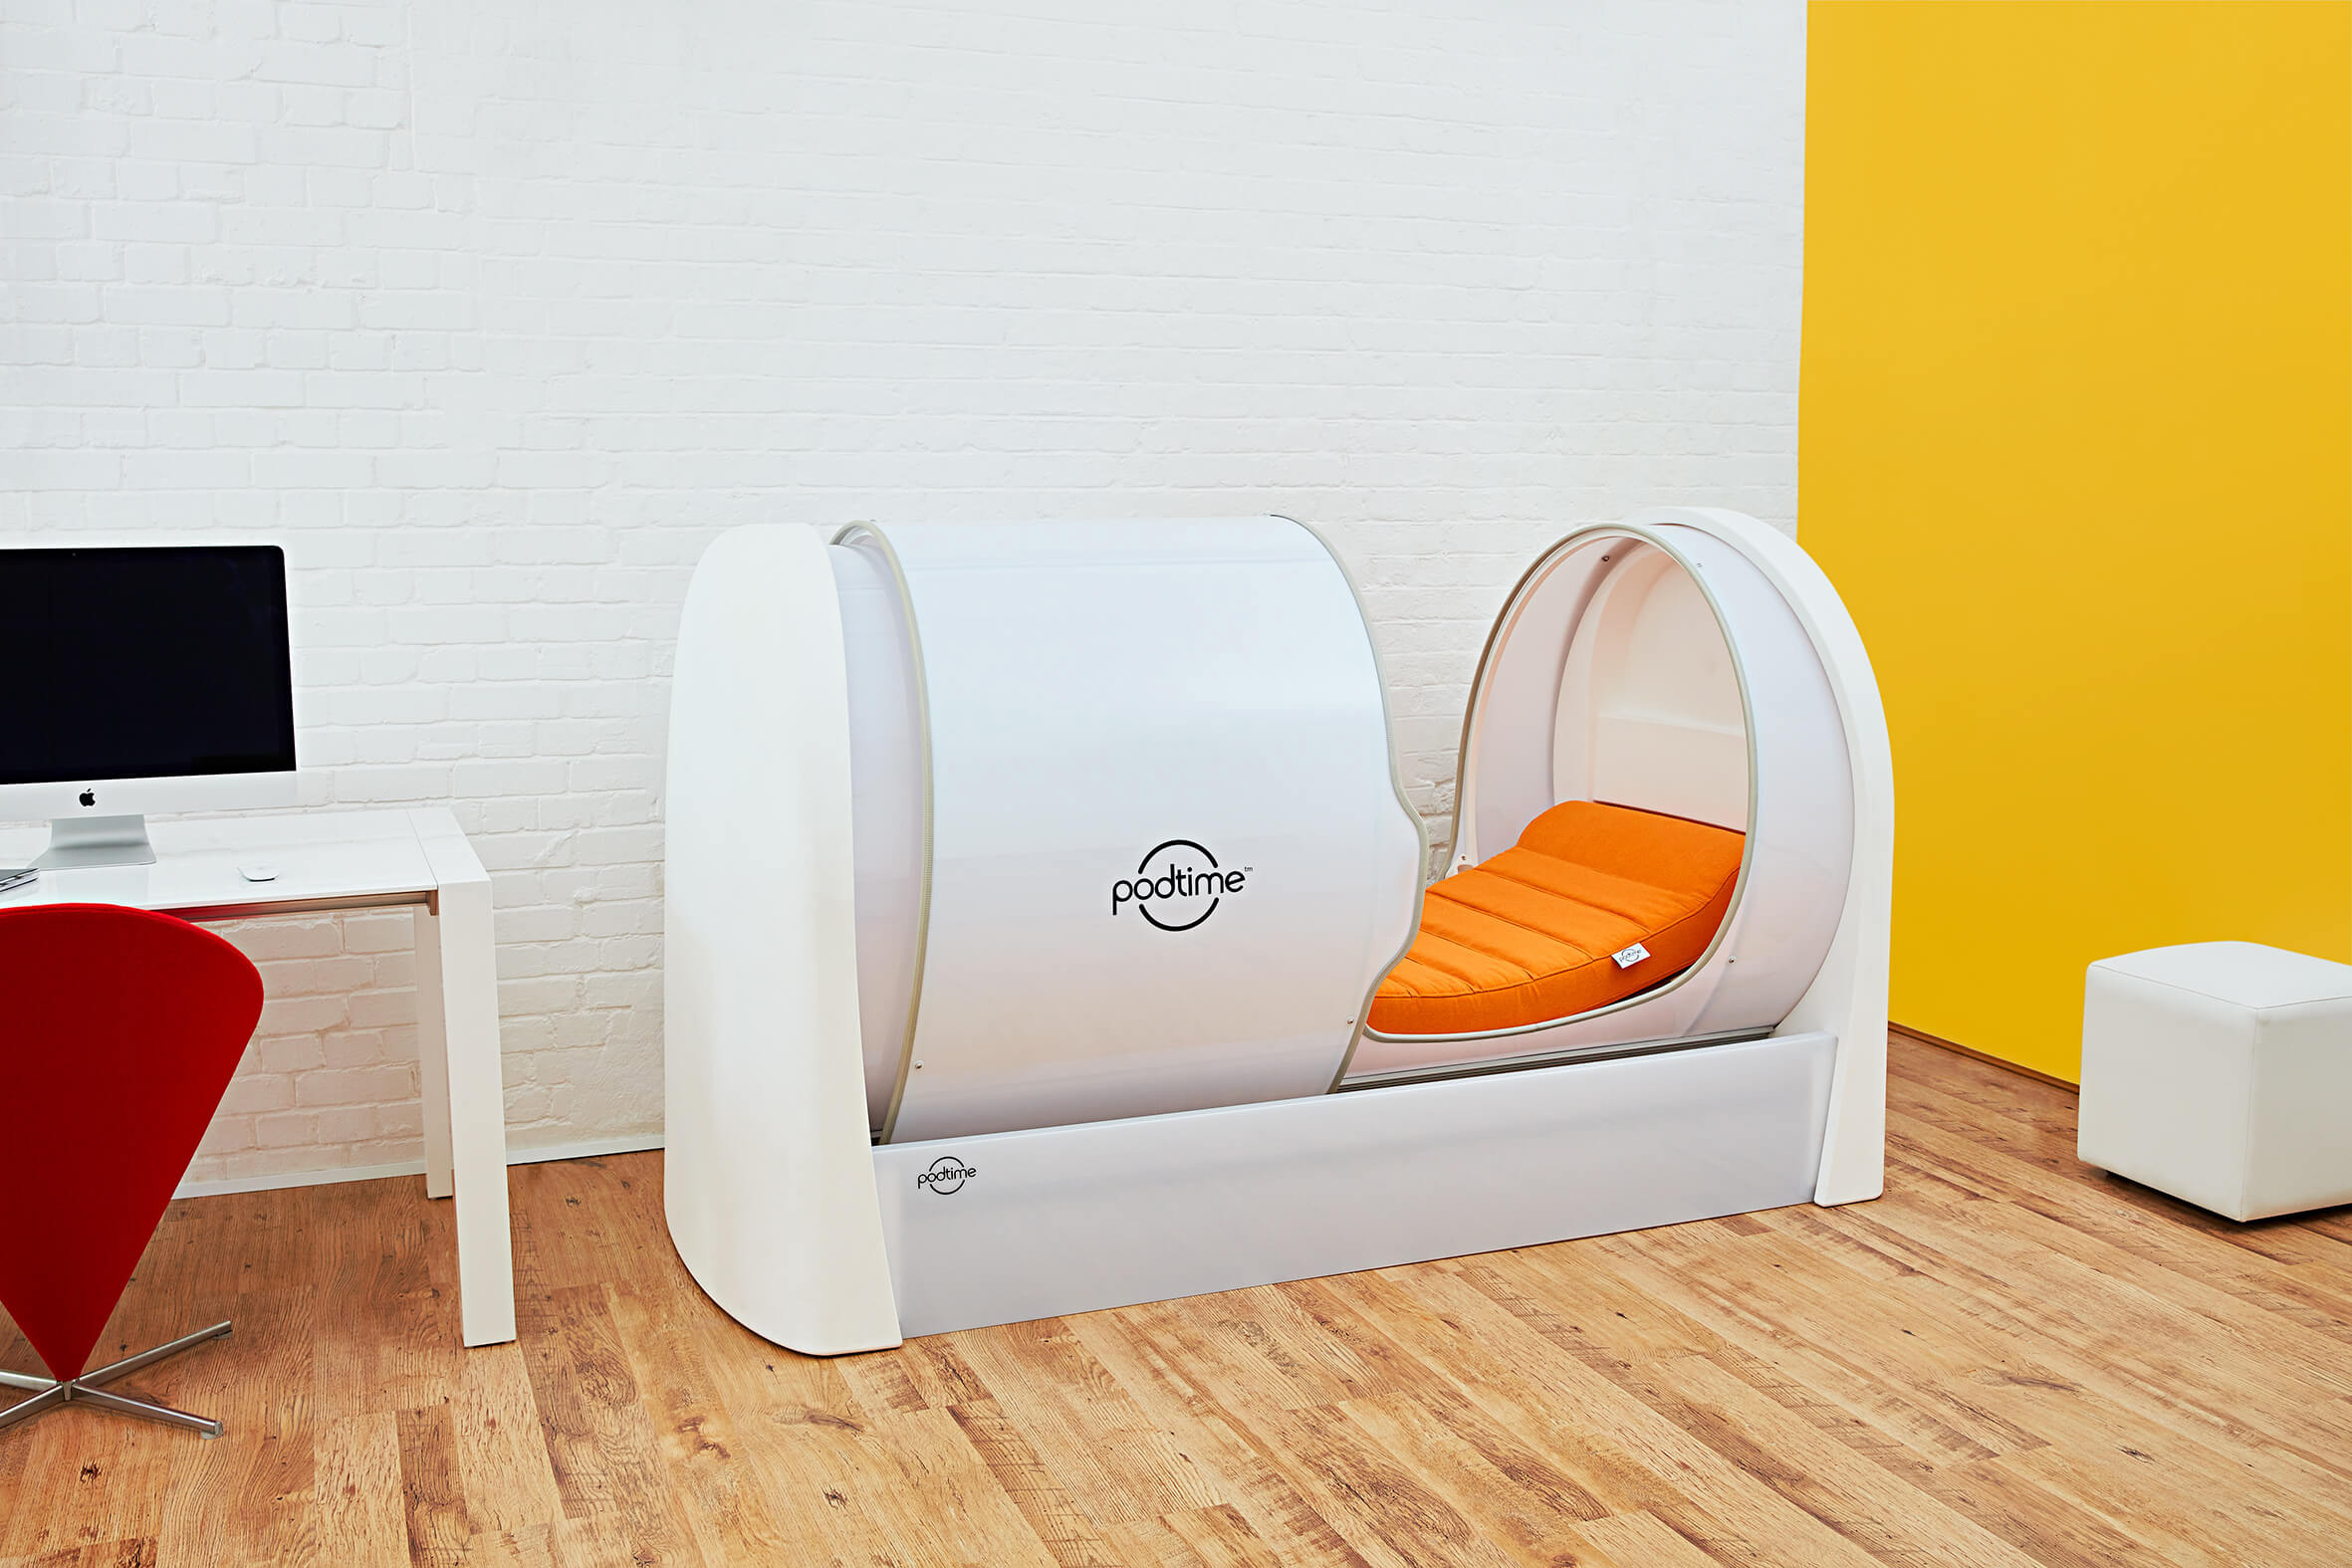 Podtime Premium Sleep Pod